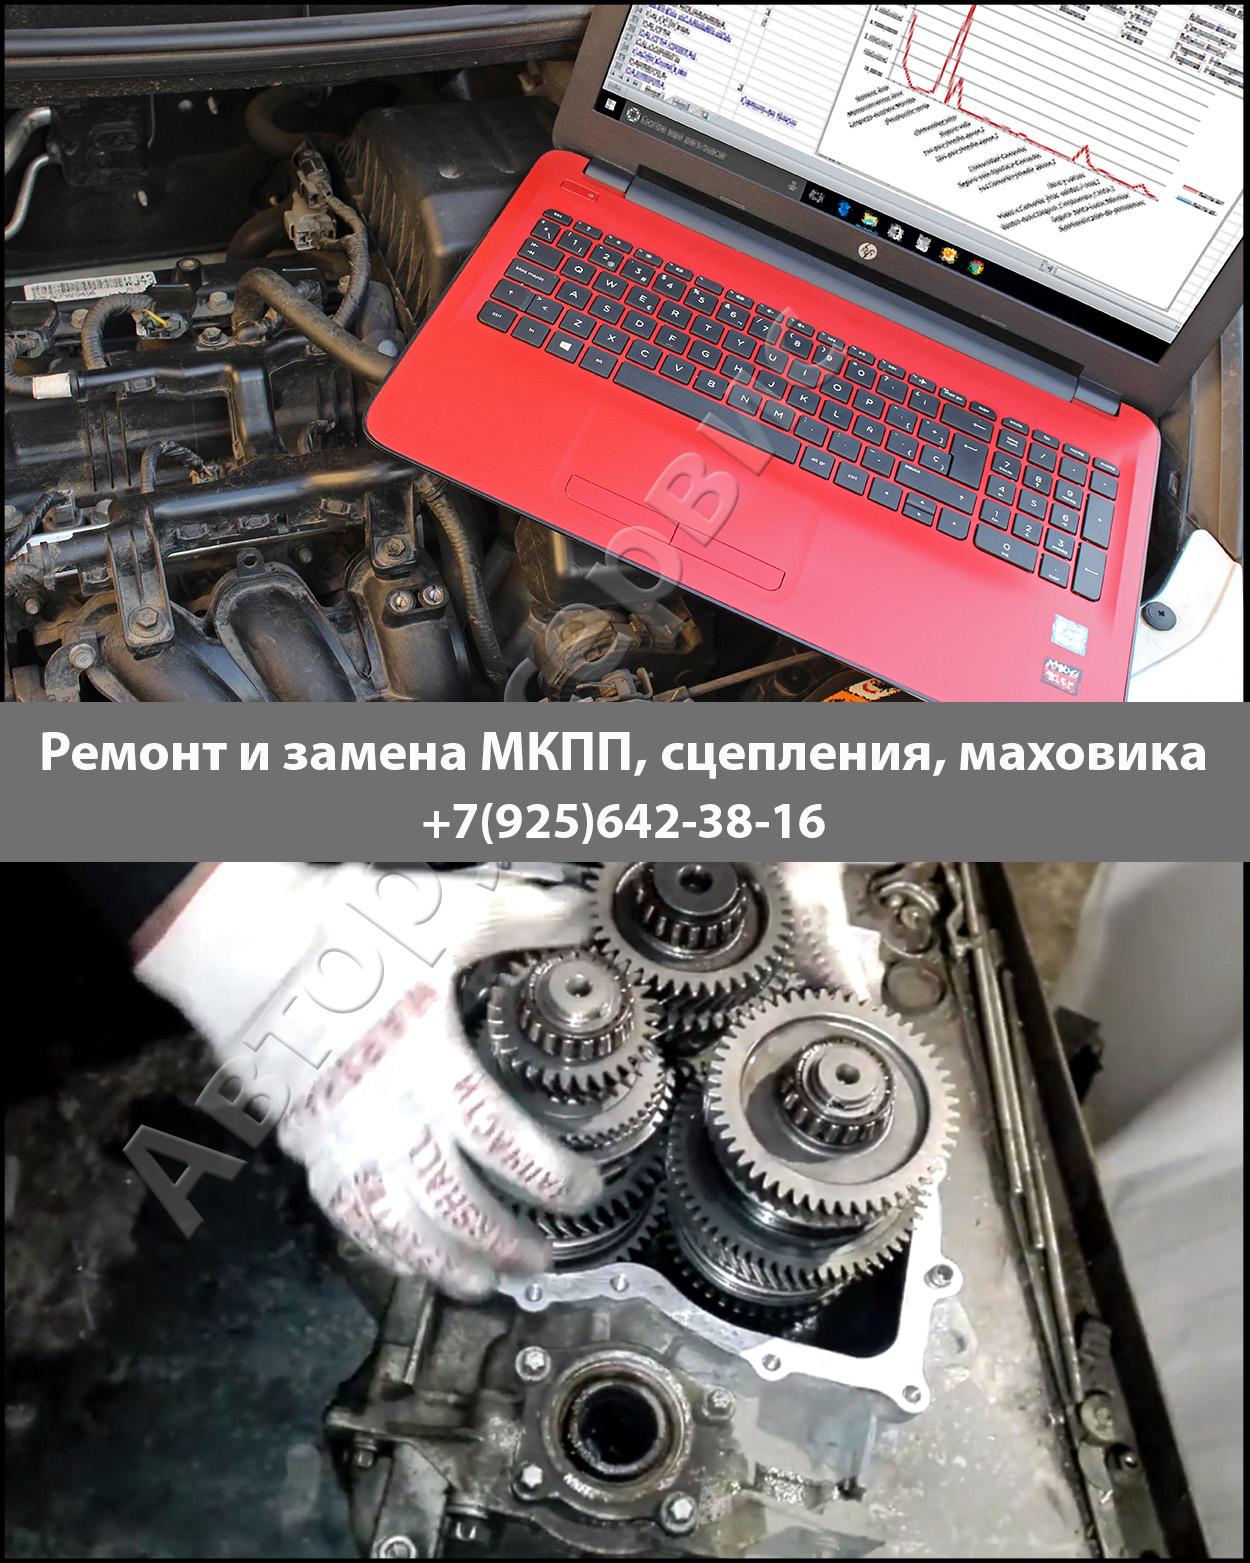 Фото ремонта МКПП Kia Magentis